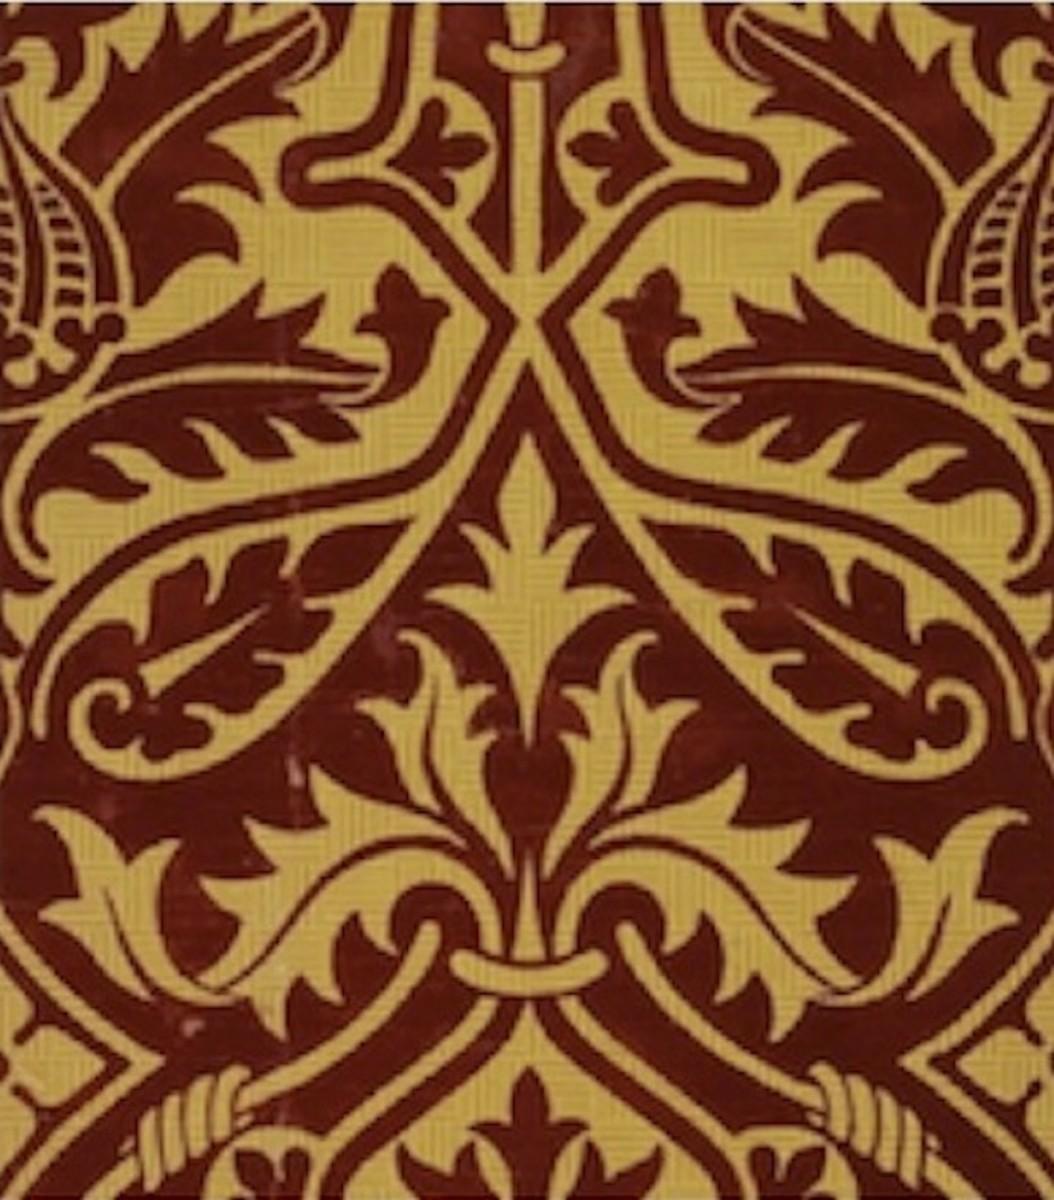 Flocked Pugin Design Wallpaper c. 1850